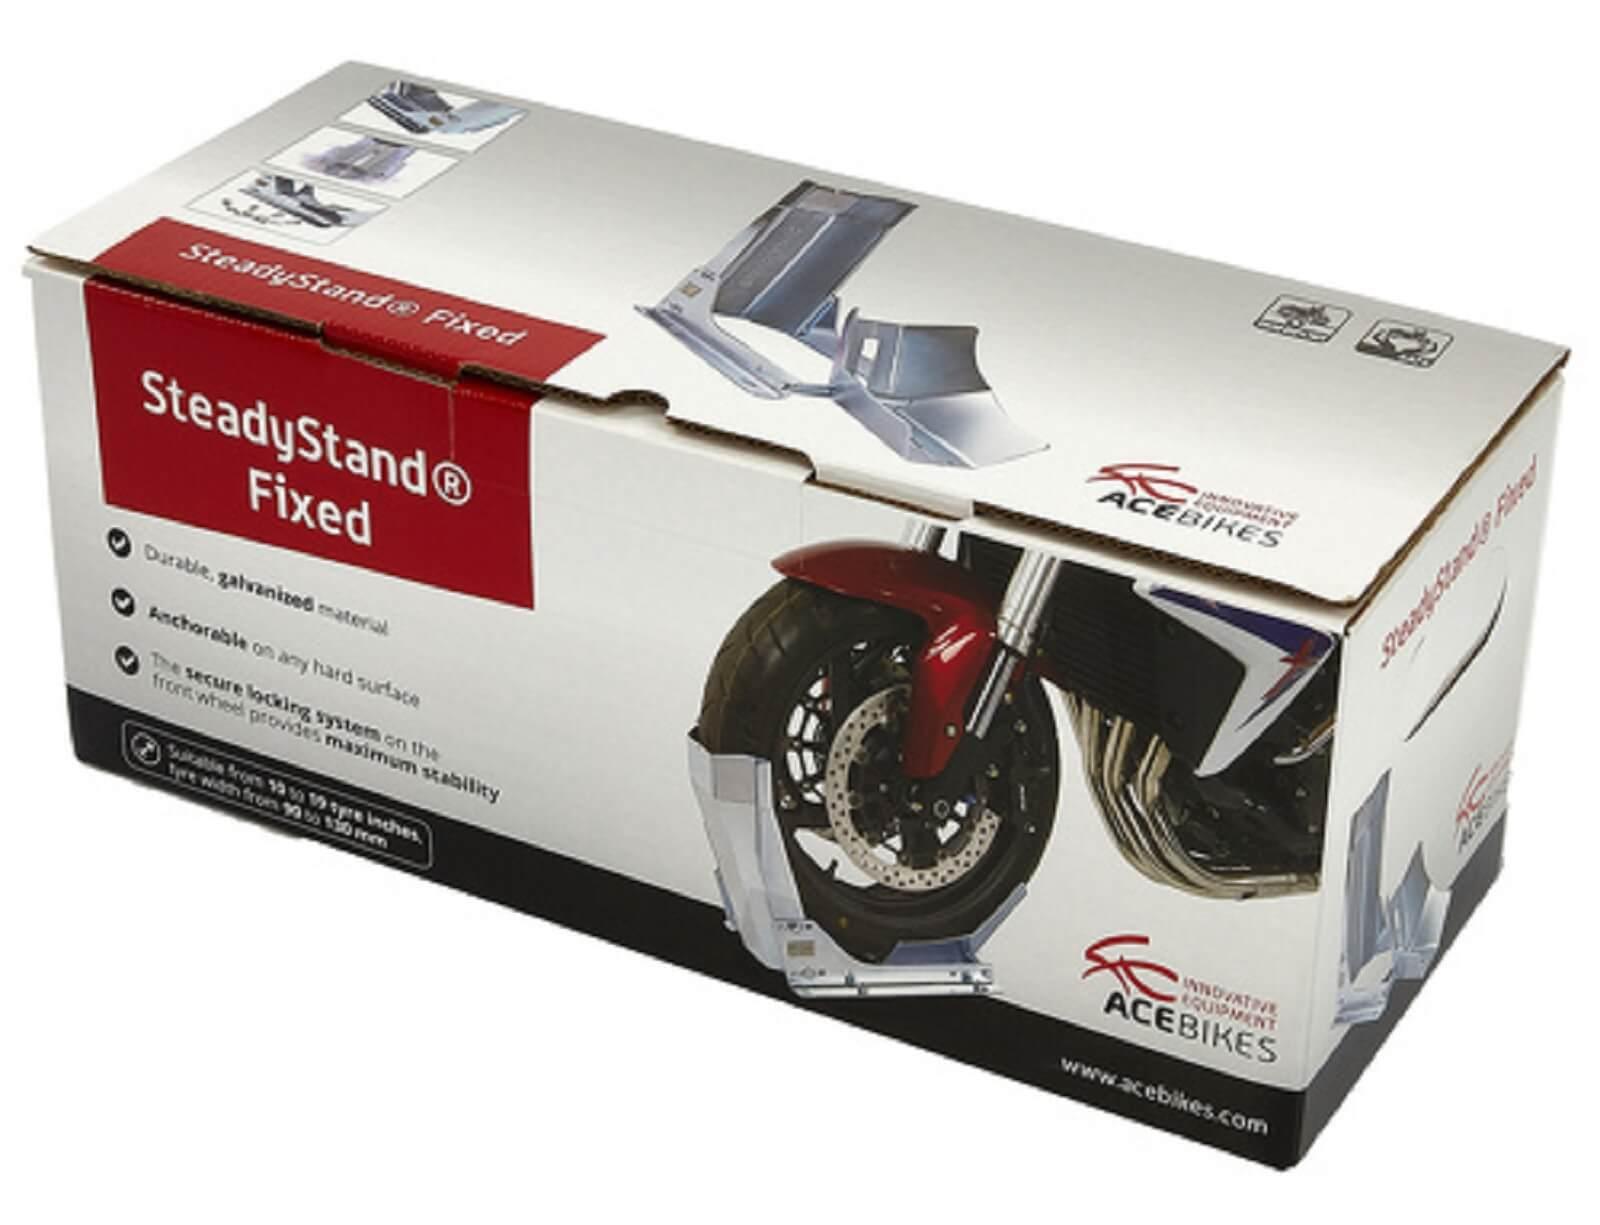 Acebikes Steadystand fixed Motorradwippe 10 bis 19 Zoll